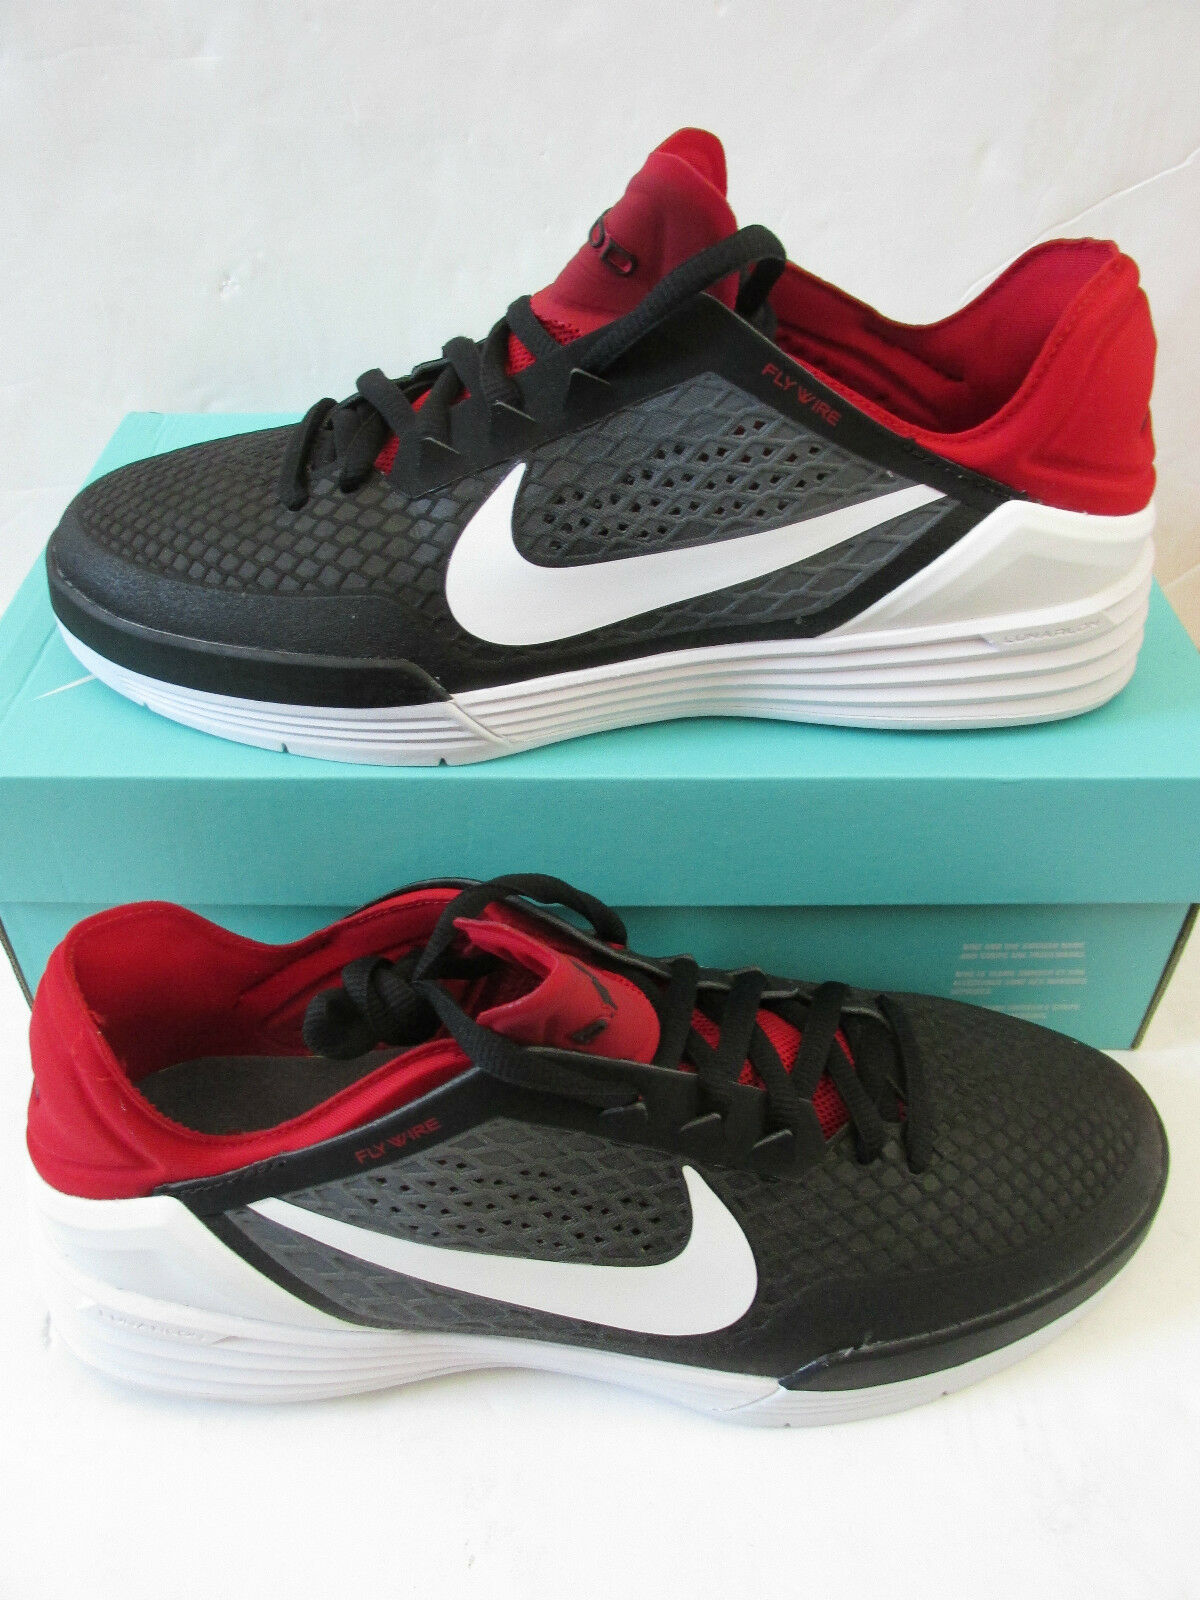 Nike Paul Rodriguez 8 Herren Turnschuhe 654158 016 Turnschuhe